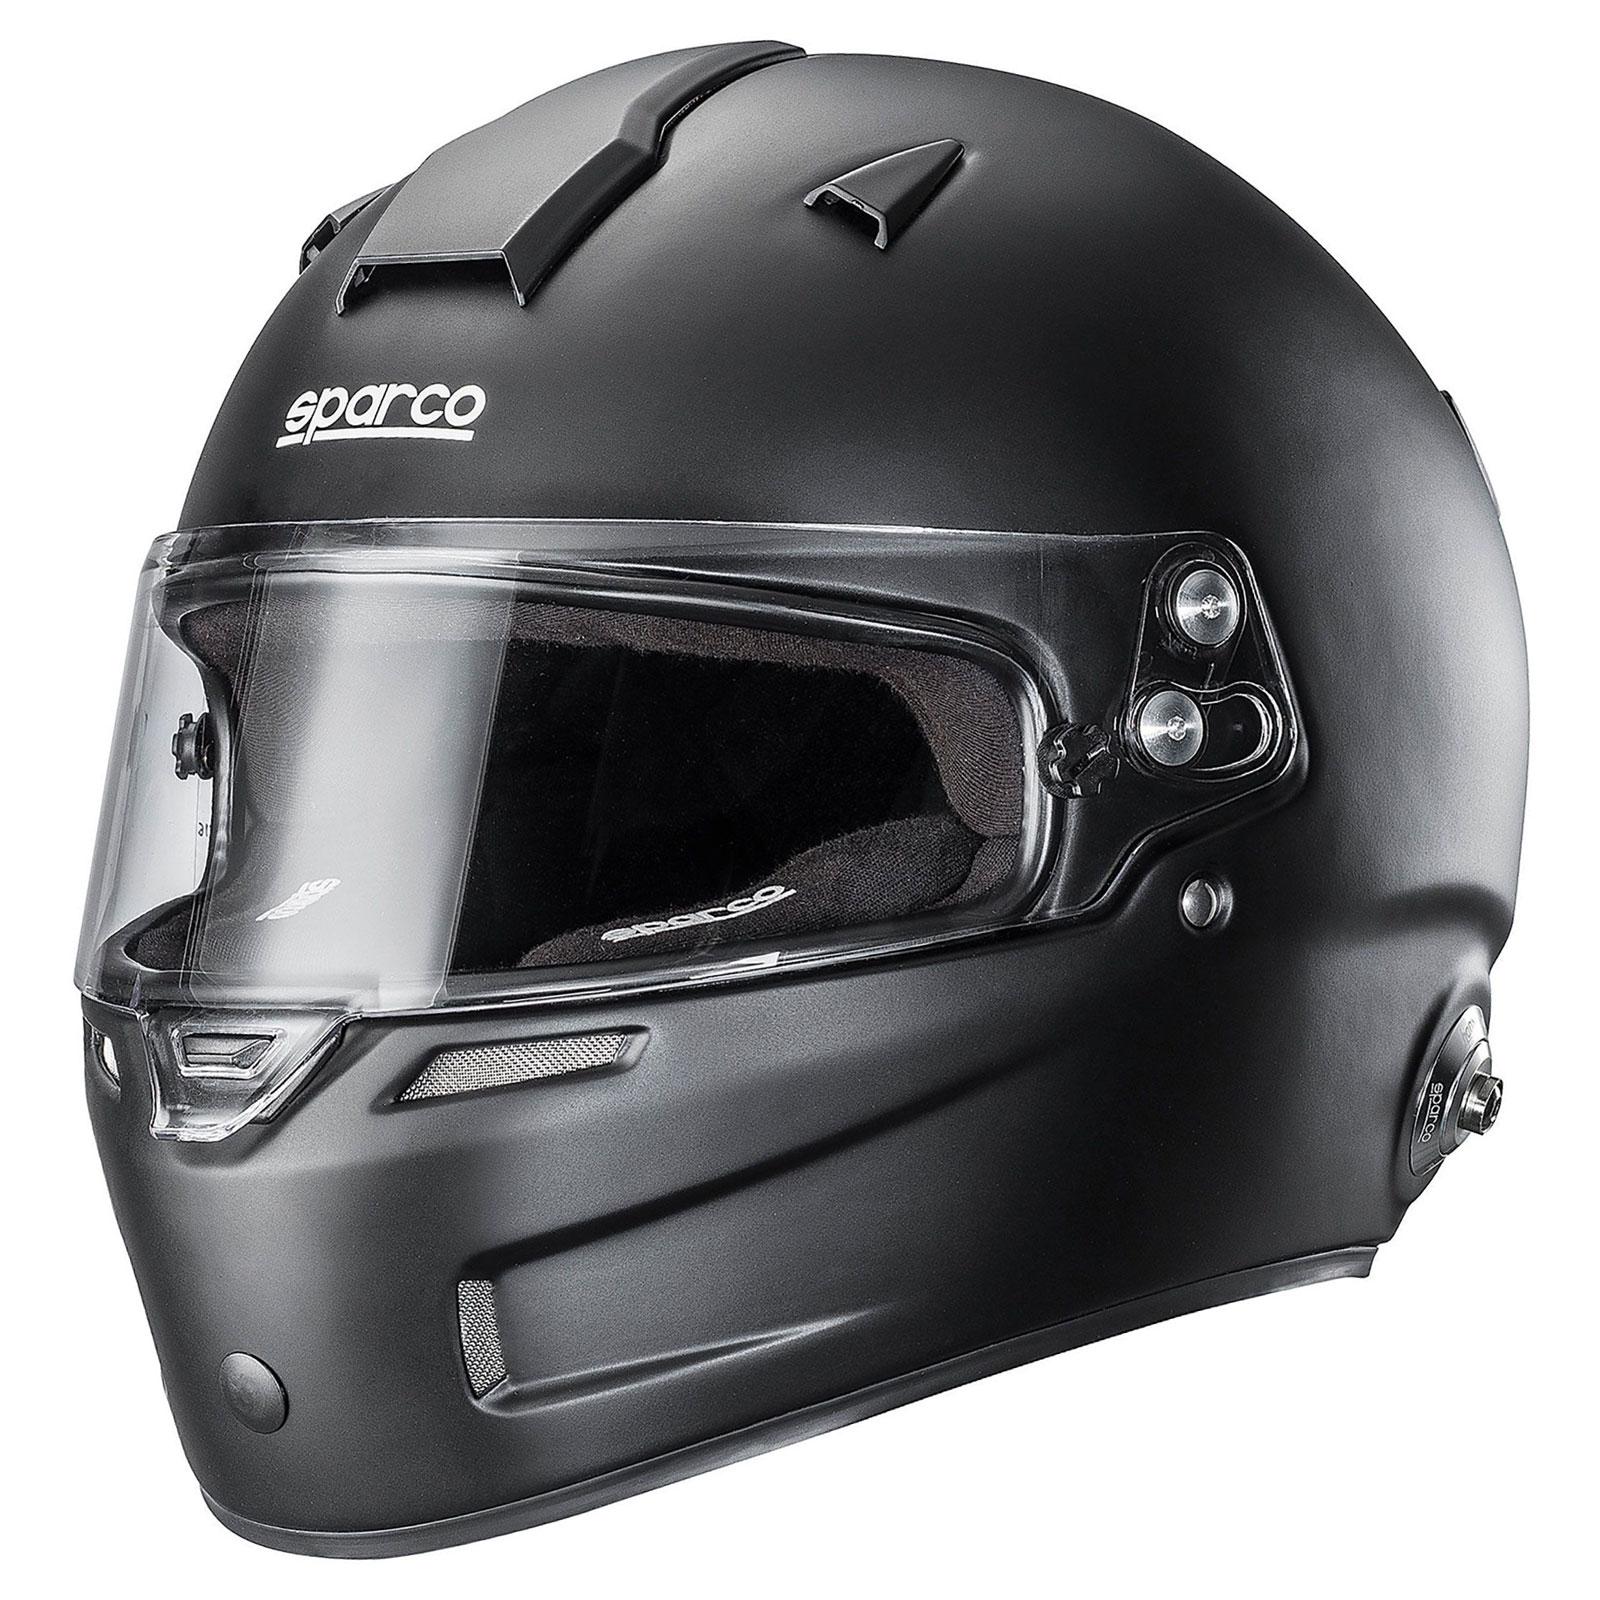 c563f36e Sparco Air Pro RF-5W Helmet Matt Black - 003345   MSAR London